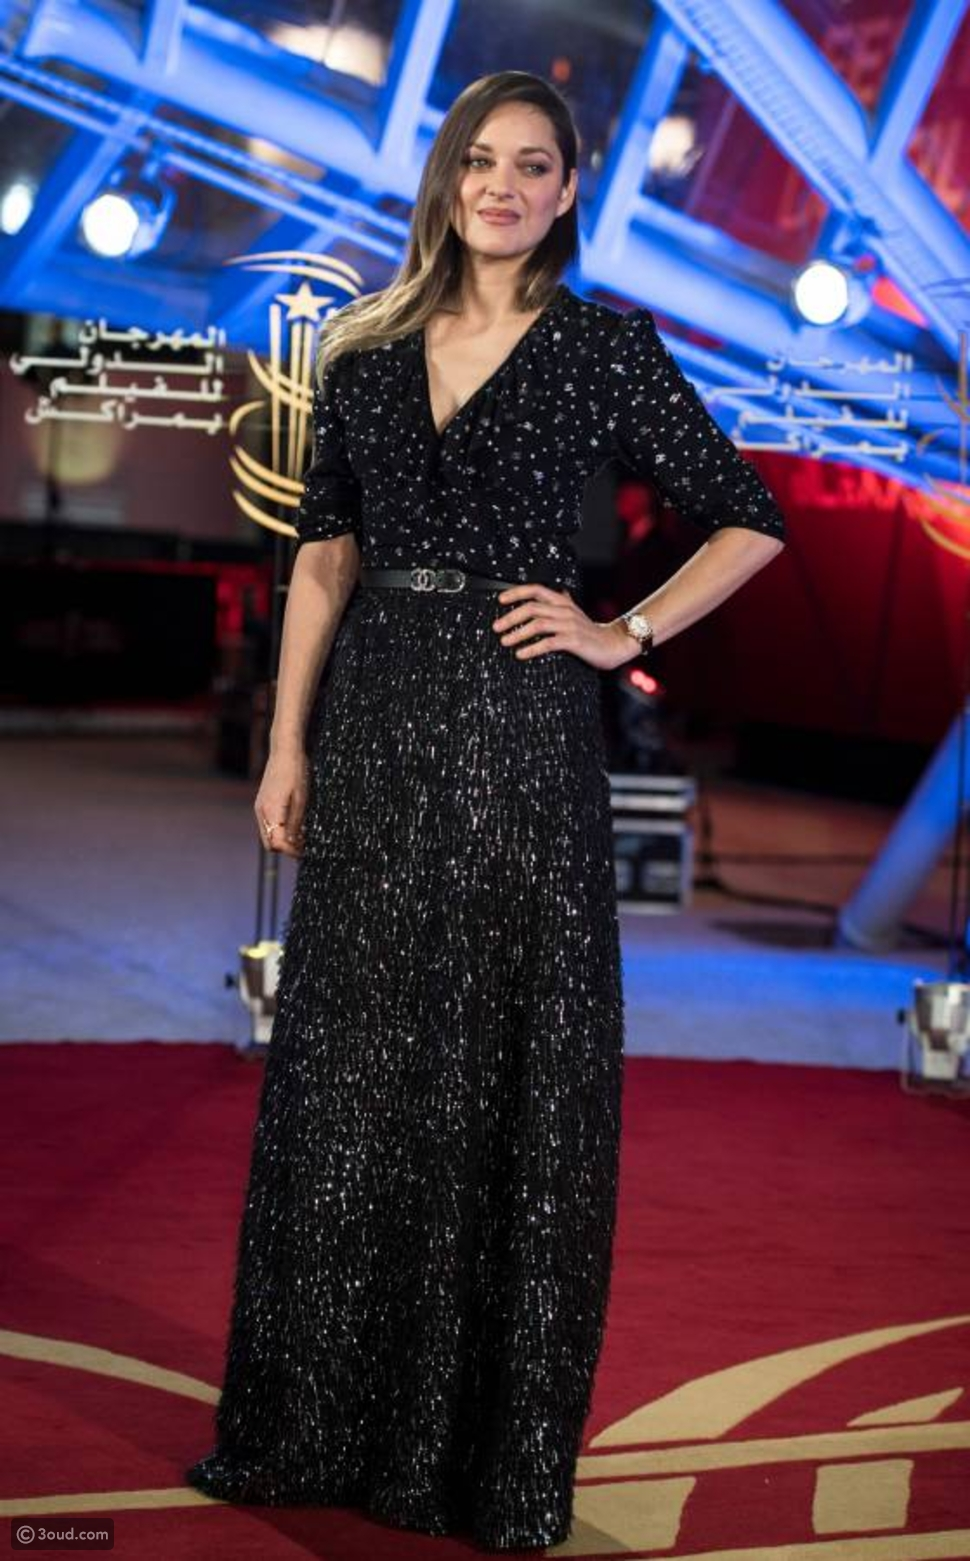 أبرز إطلالات نجوم مهرجان مراكش السينمائي